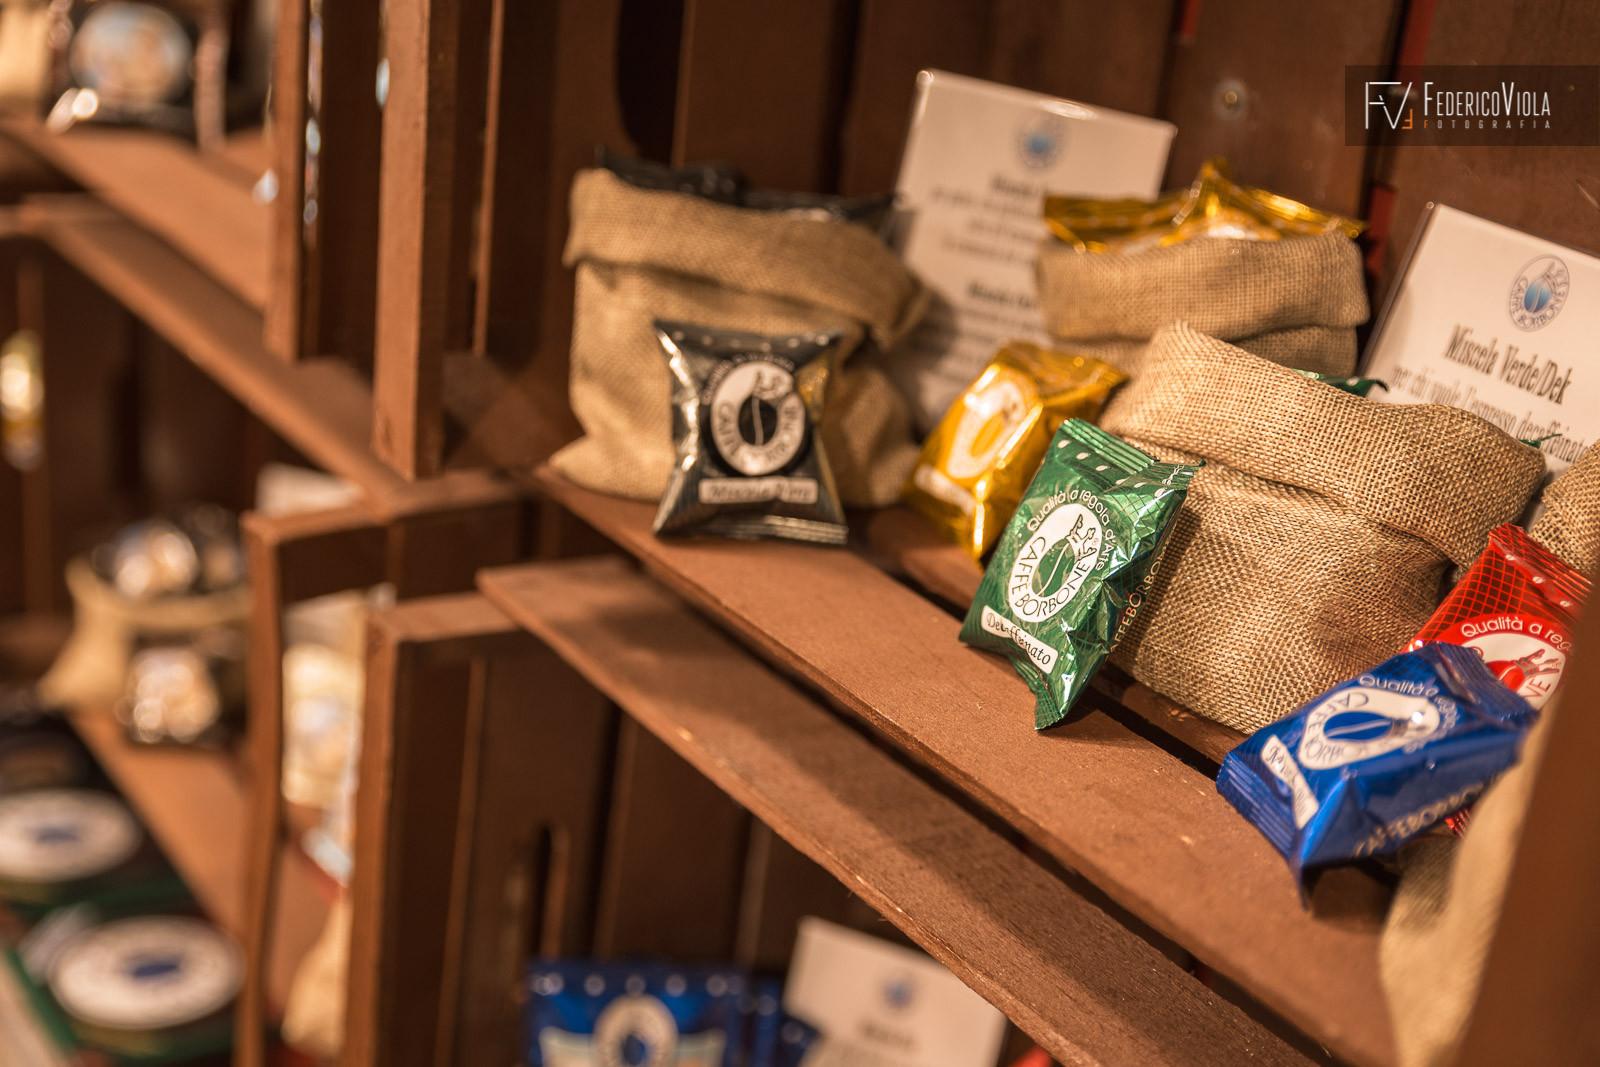 Foto-negozio-Coffee-System-Terracina-Federico-Viola-Fotografia-4